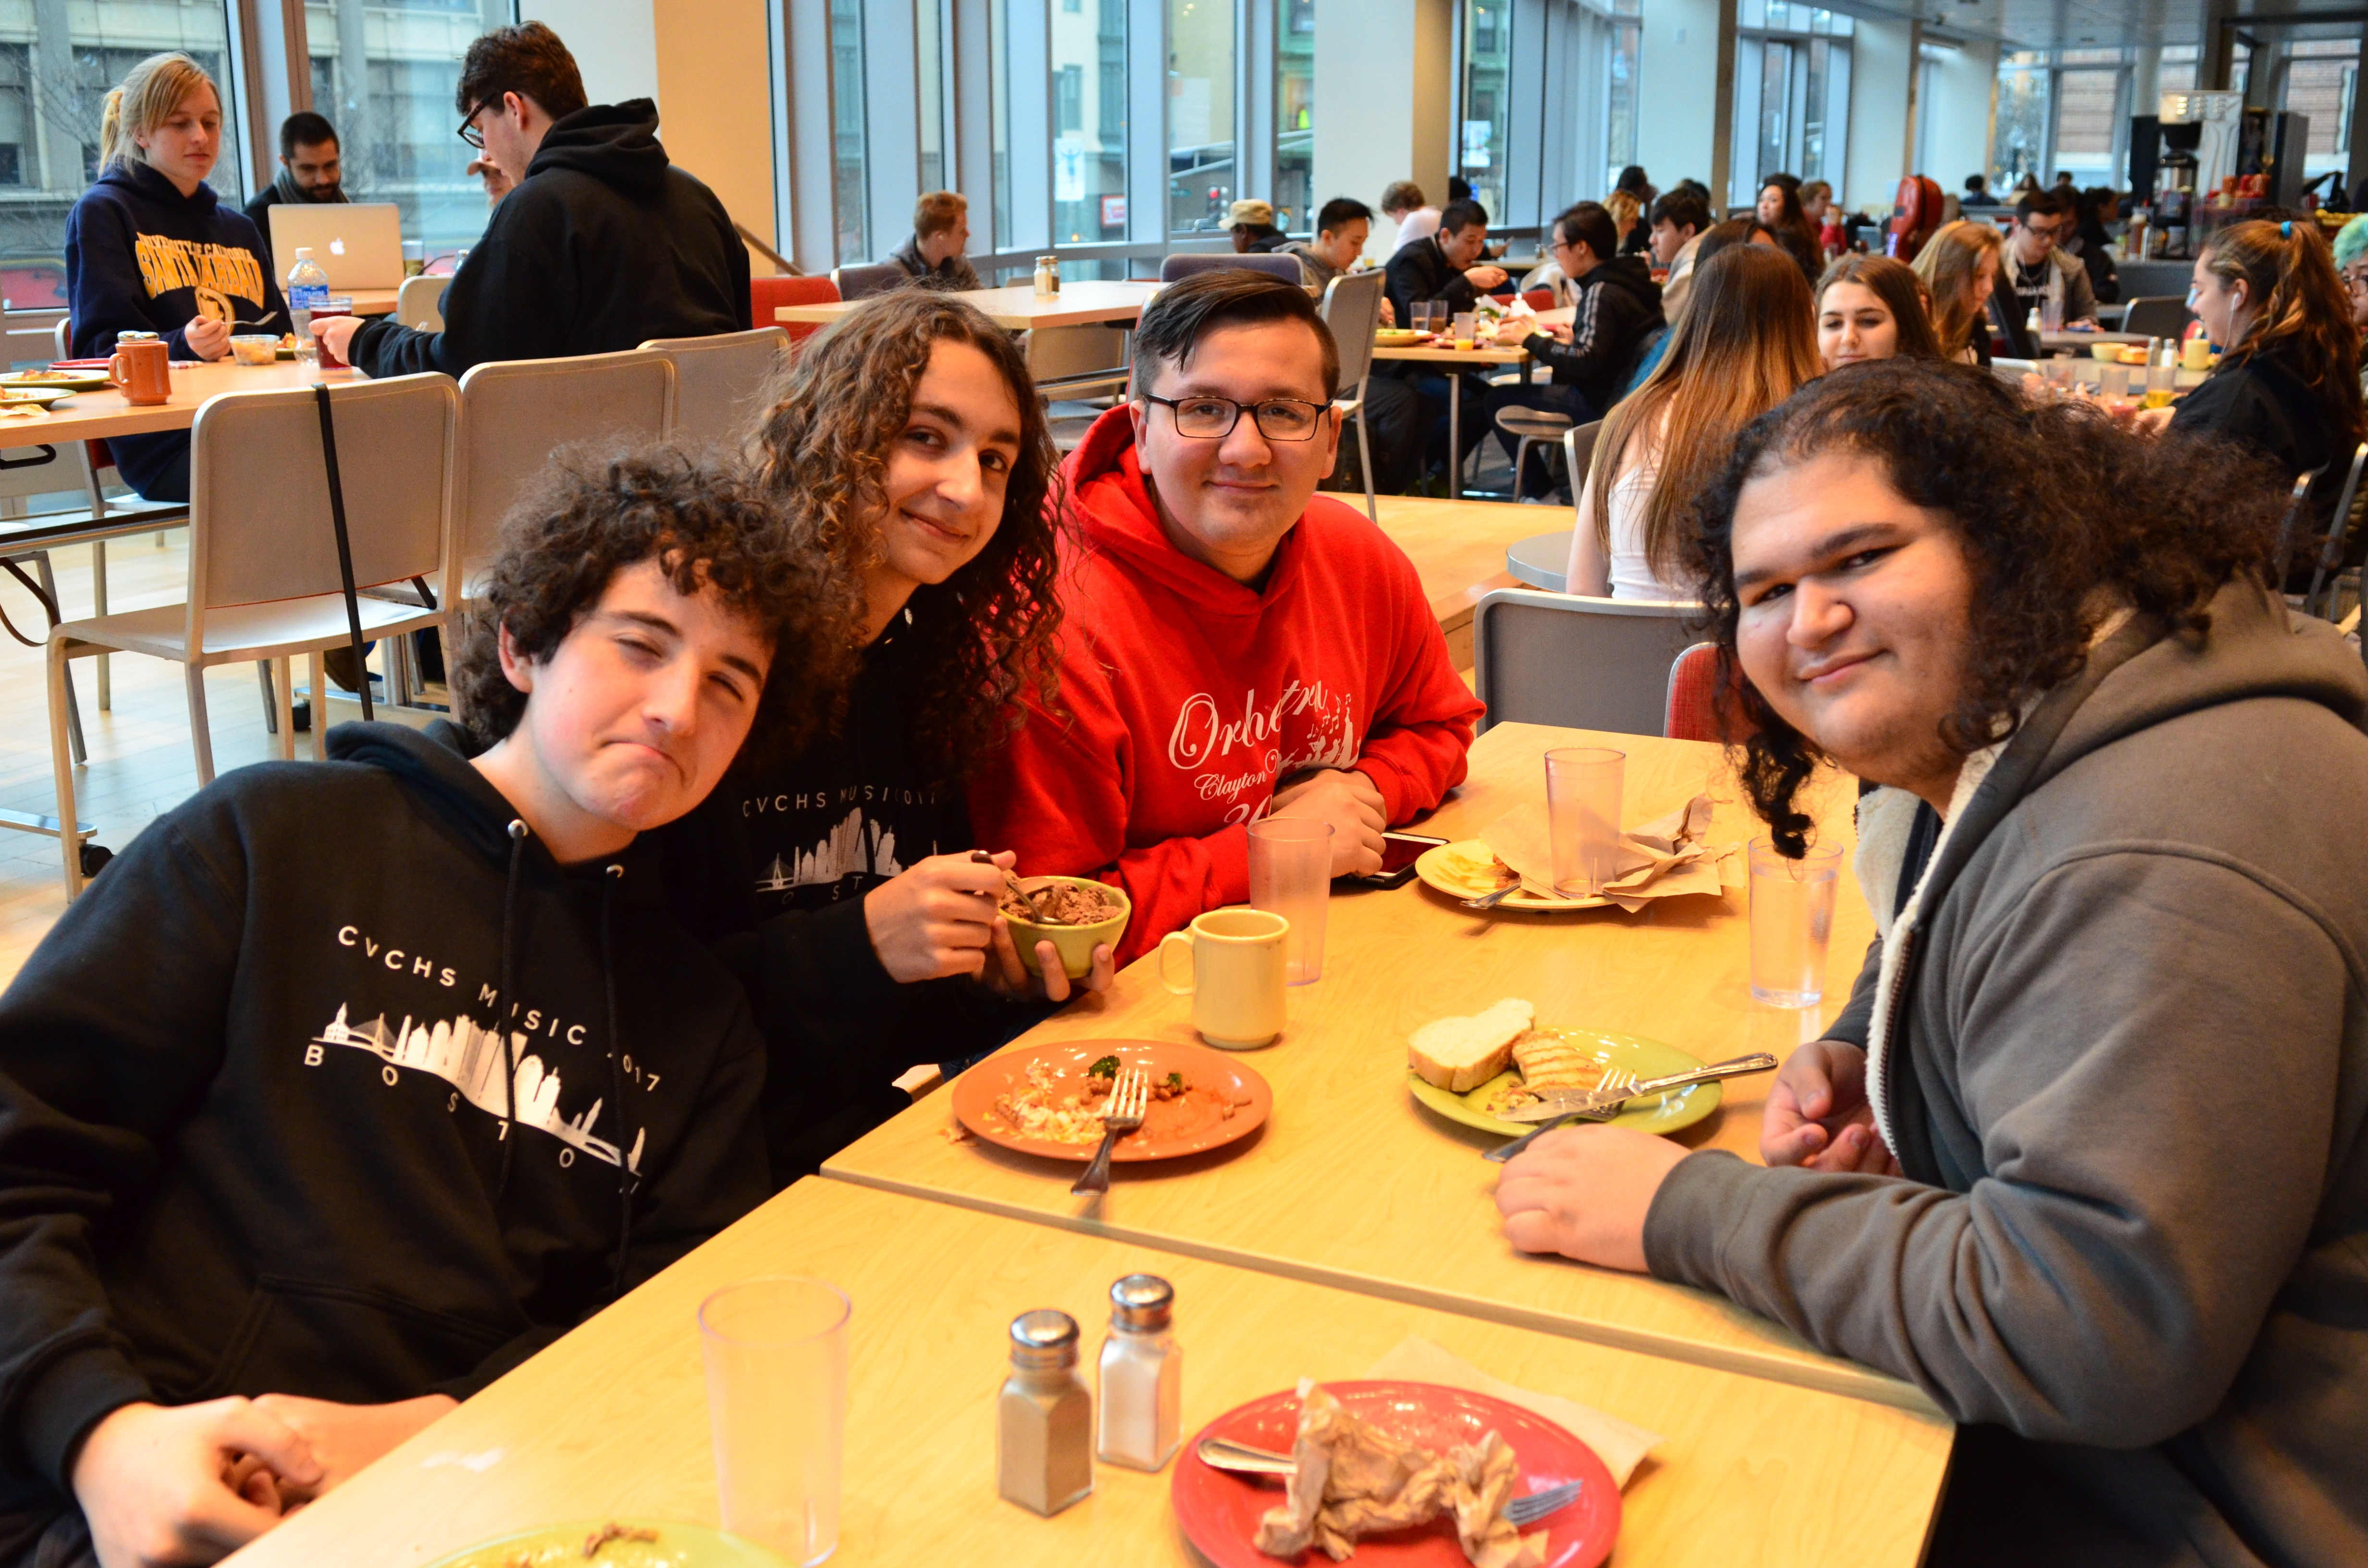 Dinner in the Berklee Dining Hall